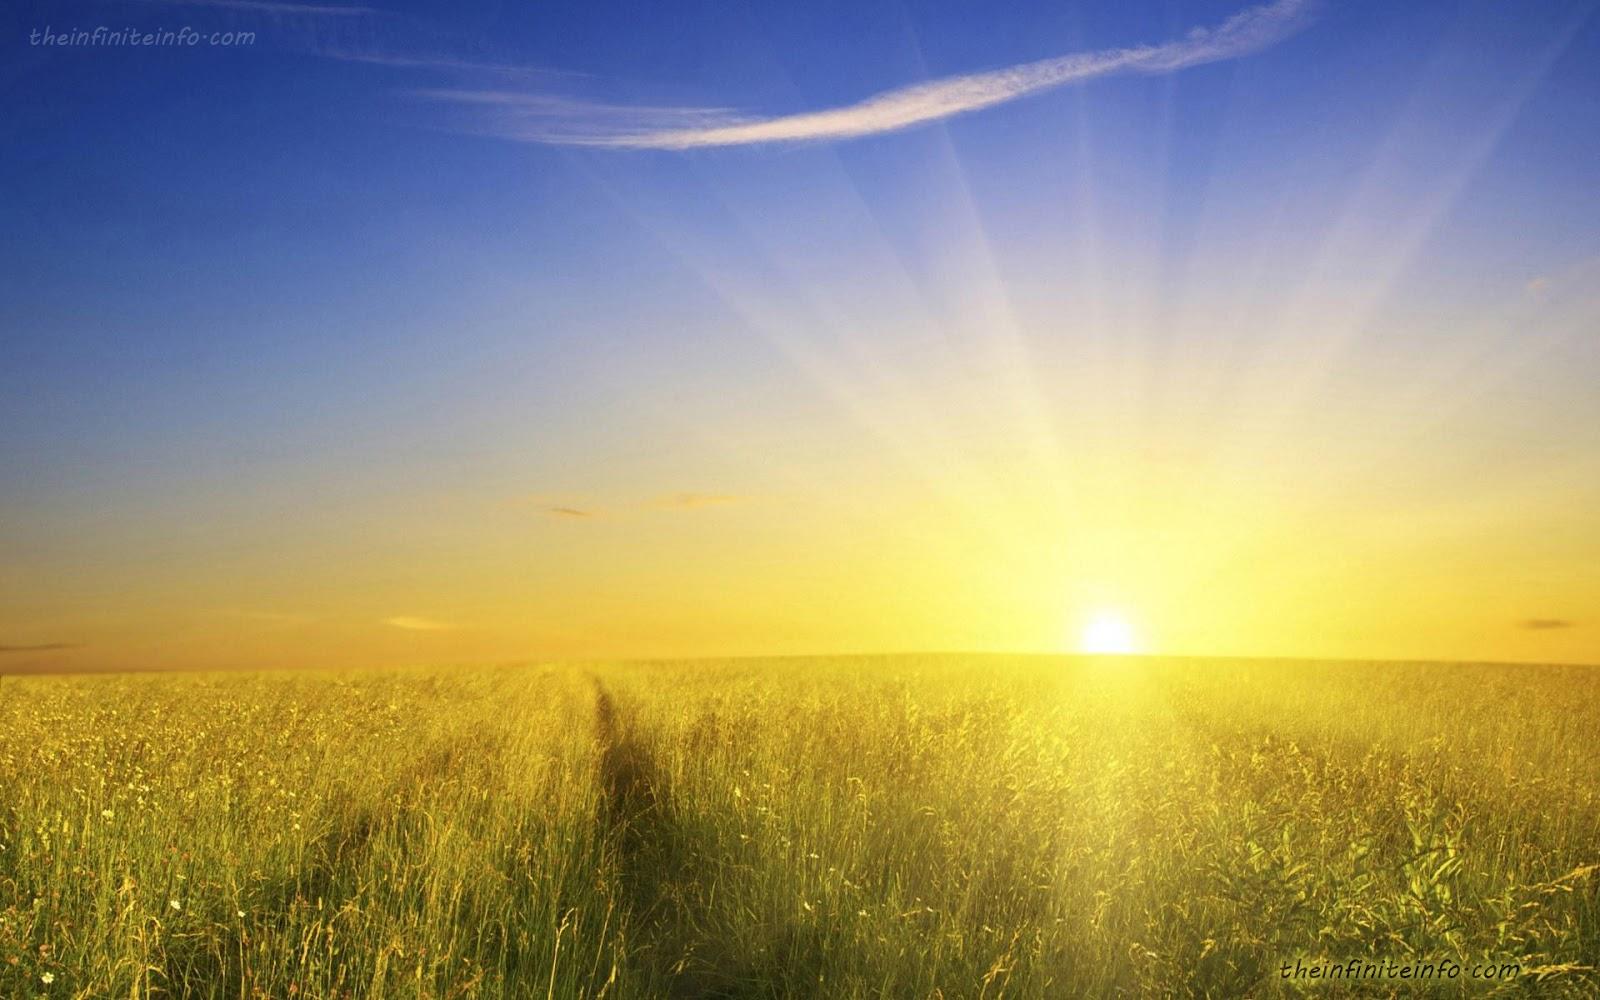 Sunshine Wallpaper, HD Sunshine Backgrounds #919BR